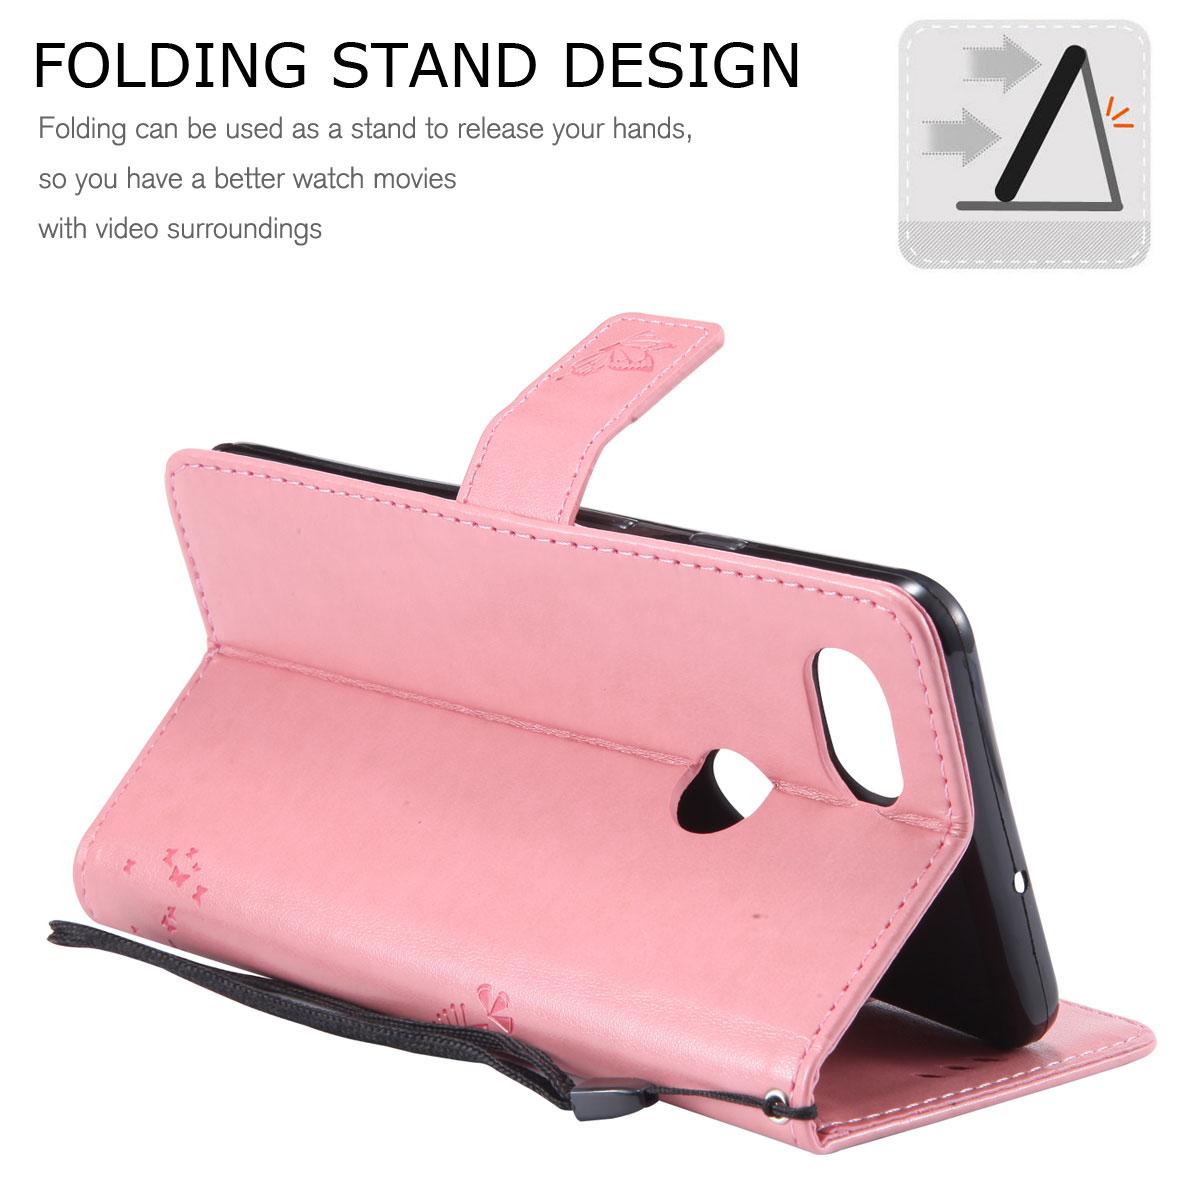 Magnetic-Leather-Credit-Card-Holder-Flip-Case-Cover-For-Google-Pixel-2-2-XL thumbnail 15